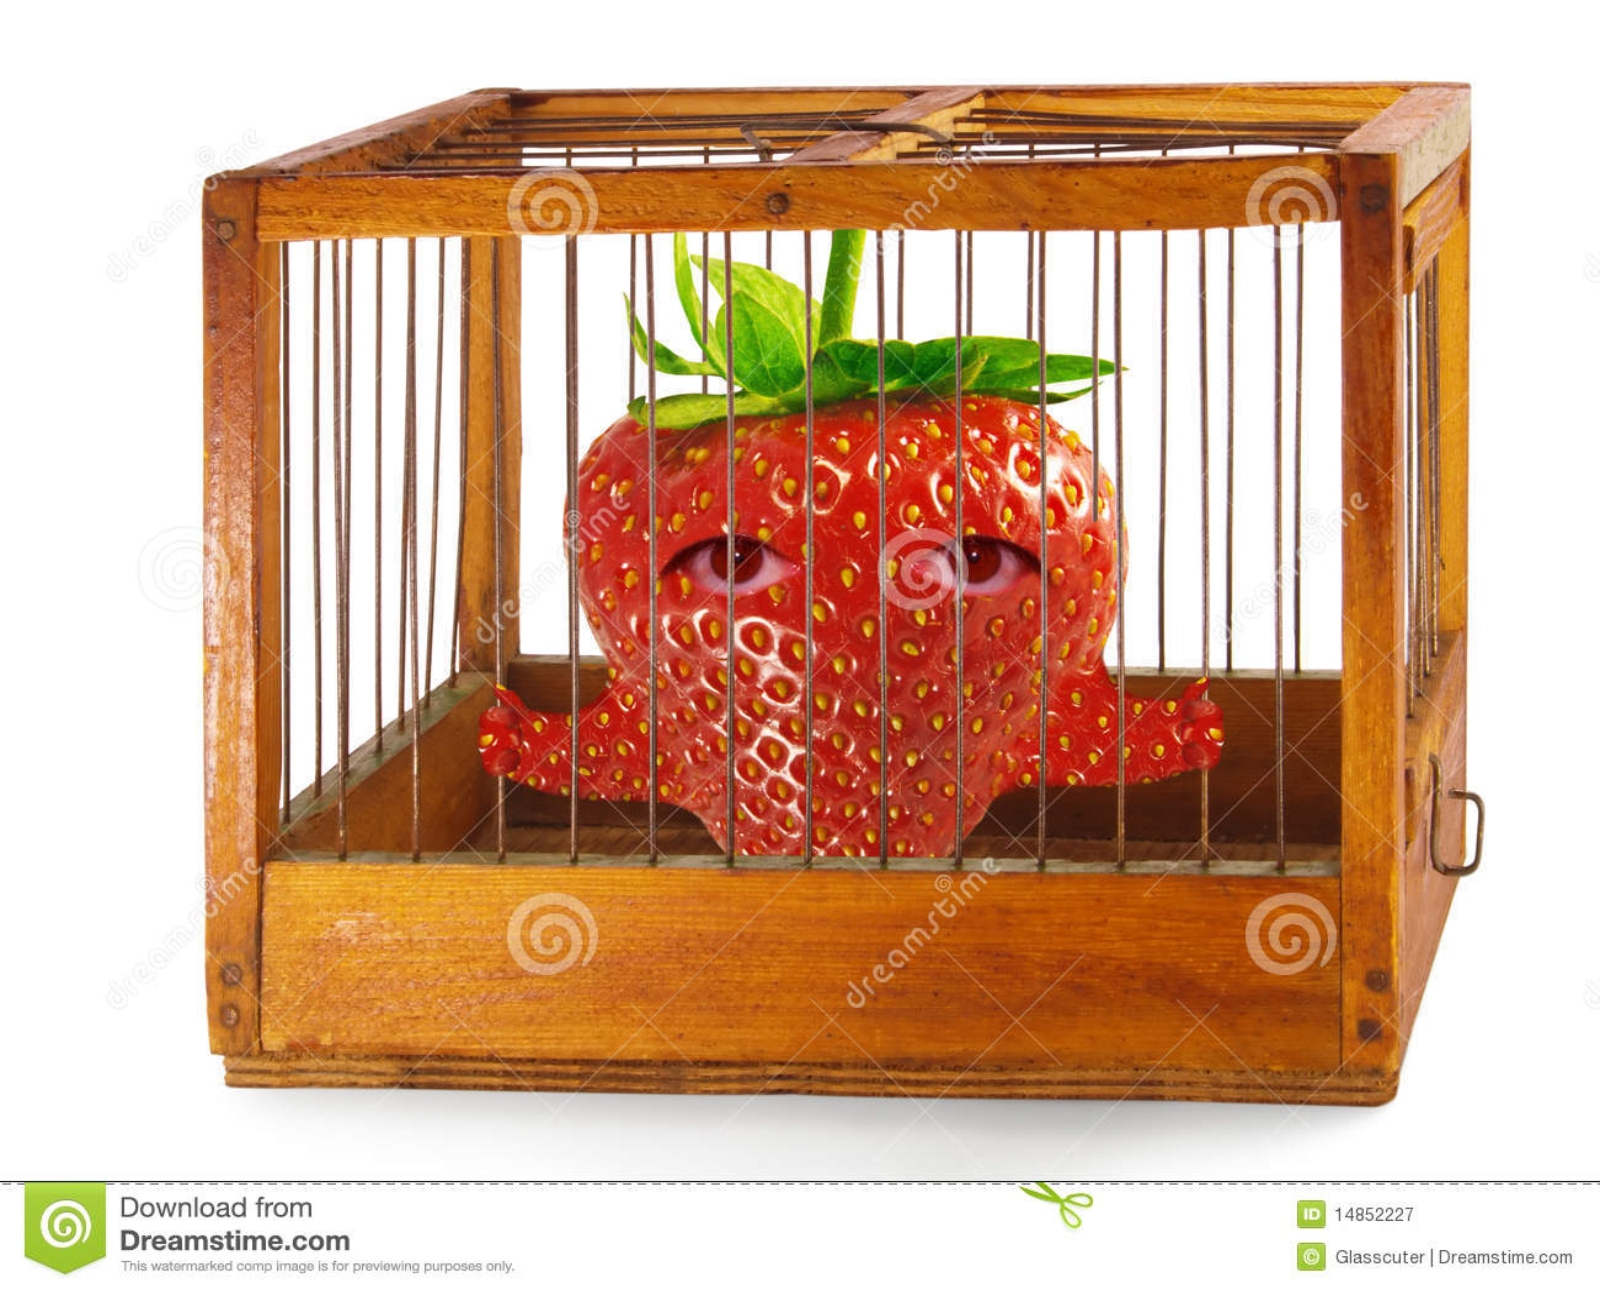 Strawberry, prisoner in the cage.